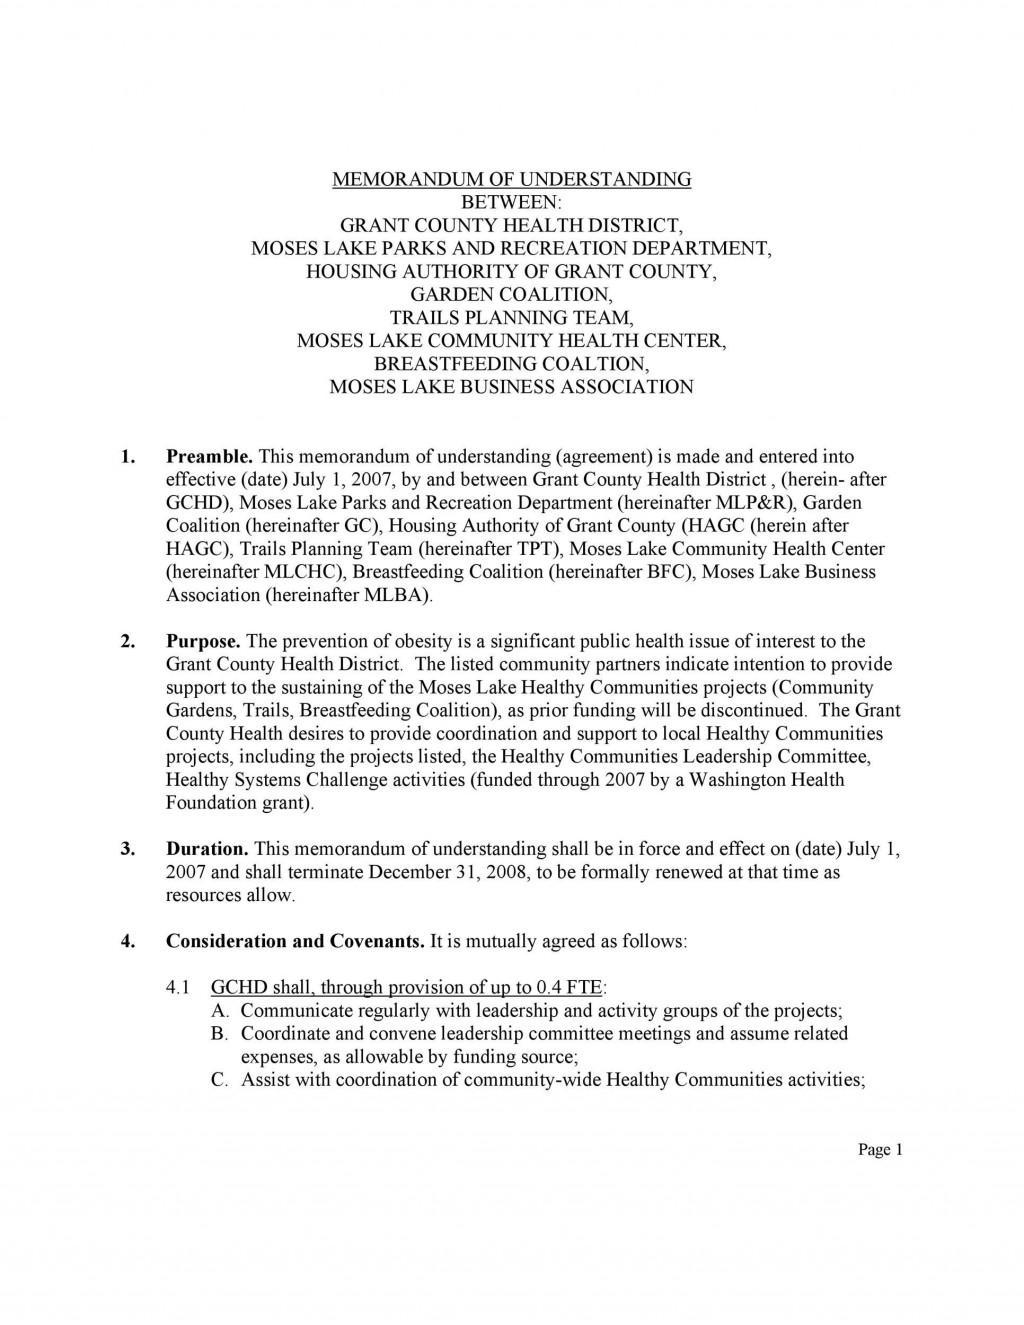 003 Singular Letter Of Understanding Format Highest Clarity  Sample MemorandumLarge